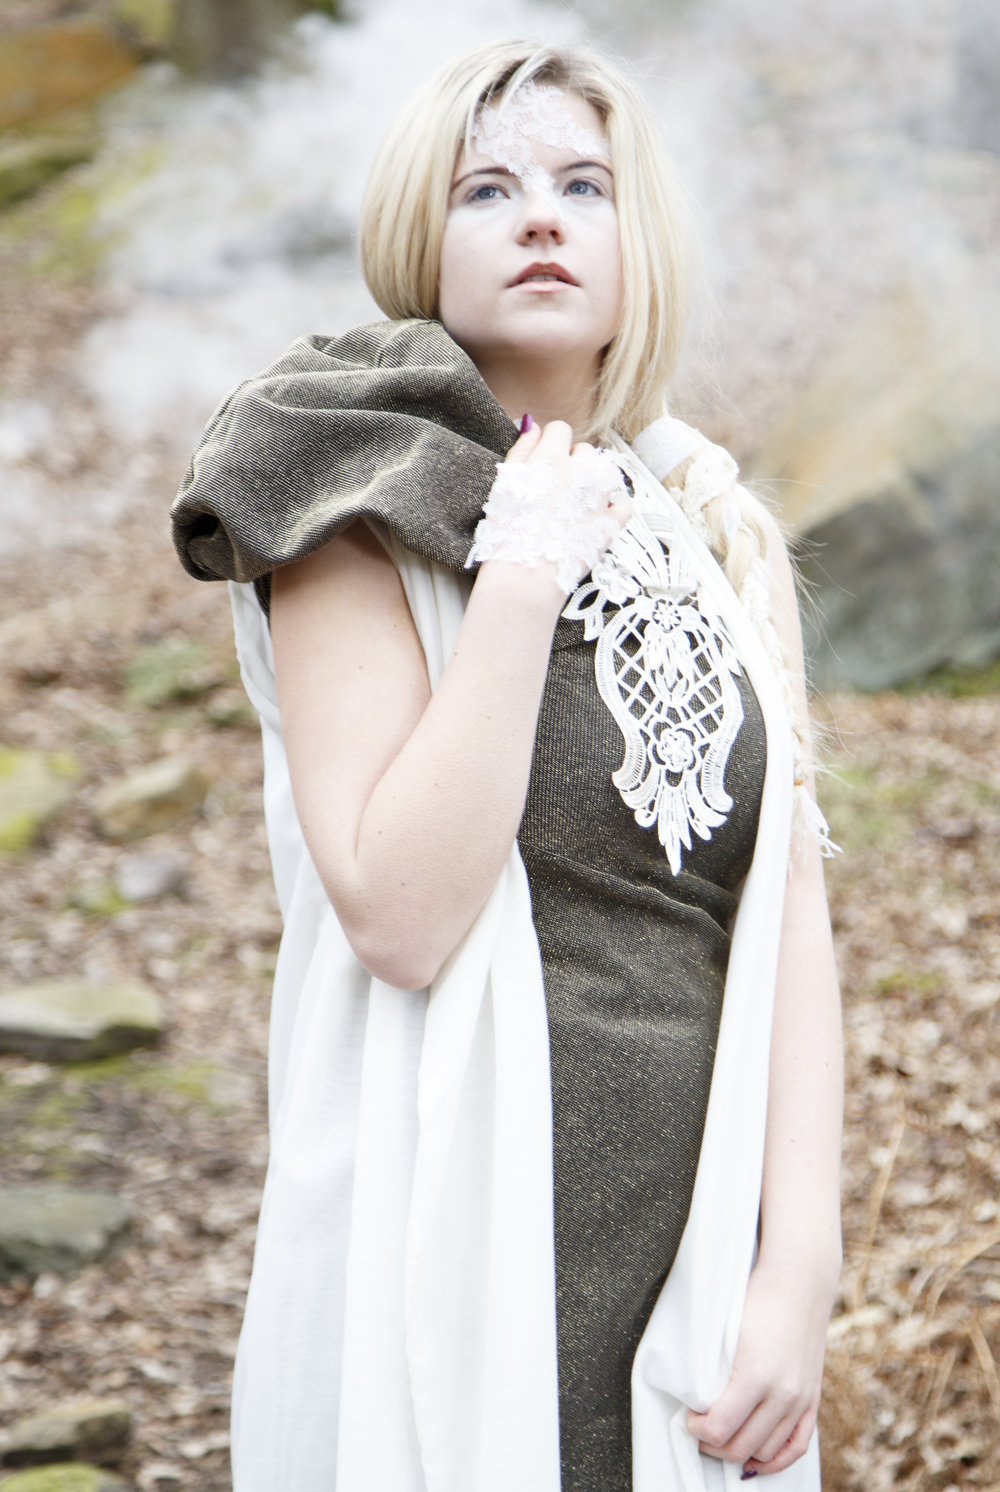 zaramia-ava-zaramiaava-leeds-fashion-designer-ethical-sustainable-smoke-versatile-drape-wrap-gold-cowl-white-dress-styling-location-womenswear-models-photoshoot-location-lace-6